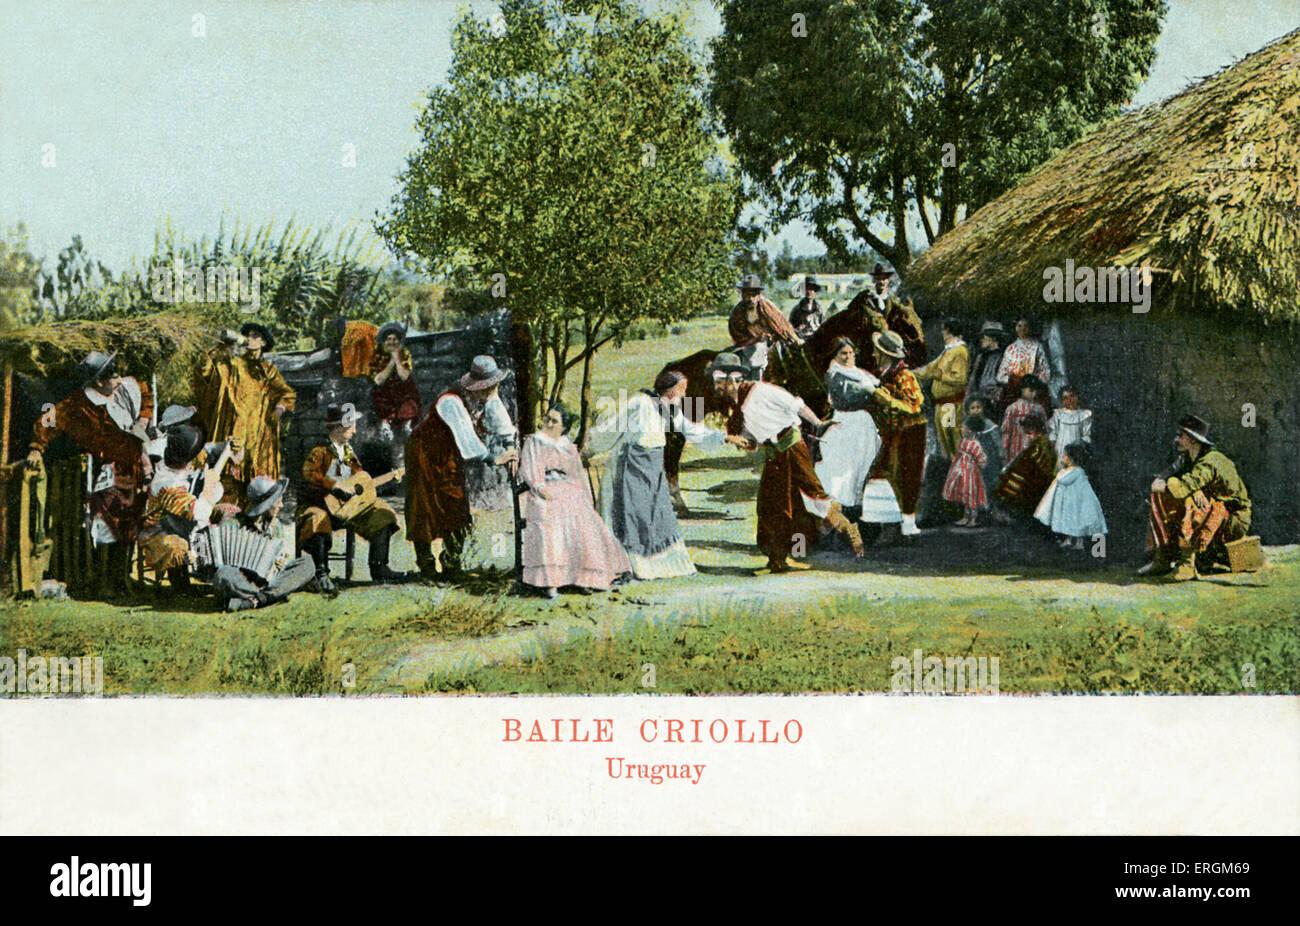 Baile Criollo/ creole dance. Folk dancing in Uruguay.  Early 20th century postcard. - Stock Image